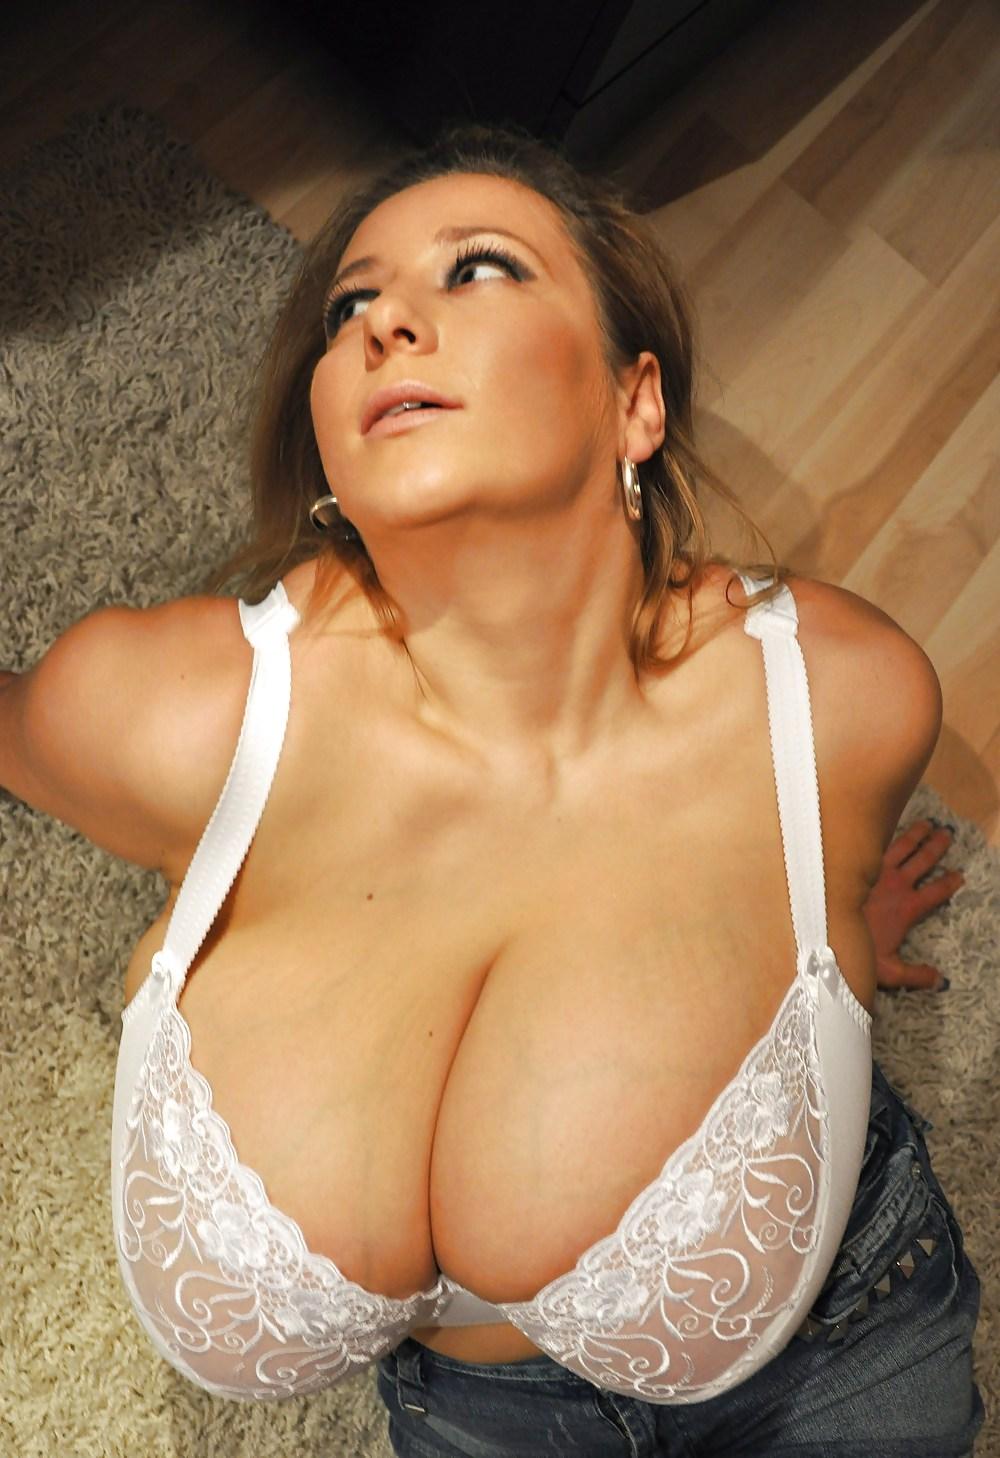 girl-birthday-busty-tits-white-bra-lesbian-who-lick